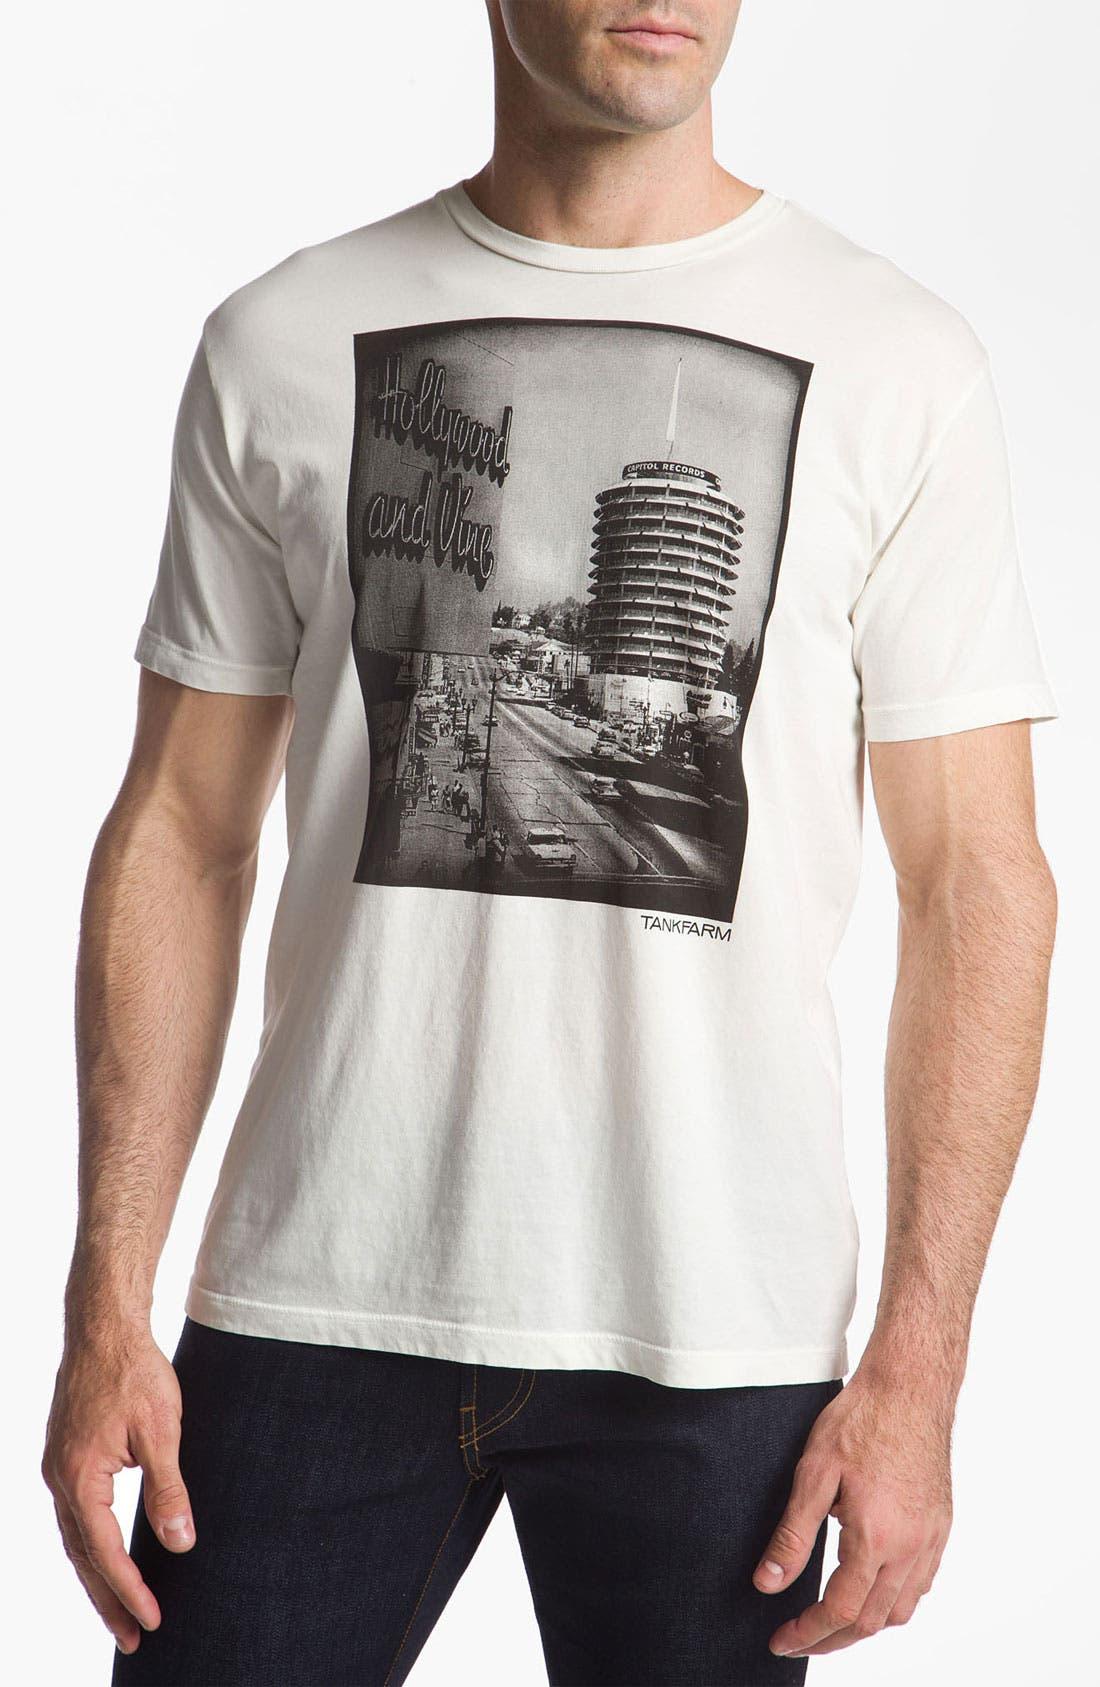 Alternate Image 1 Selected - Tankfarm 'Hollywood & Vine' T-Shirt